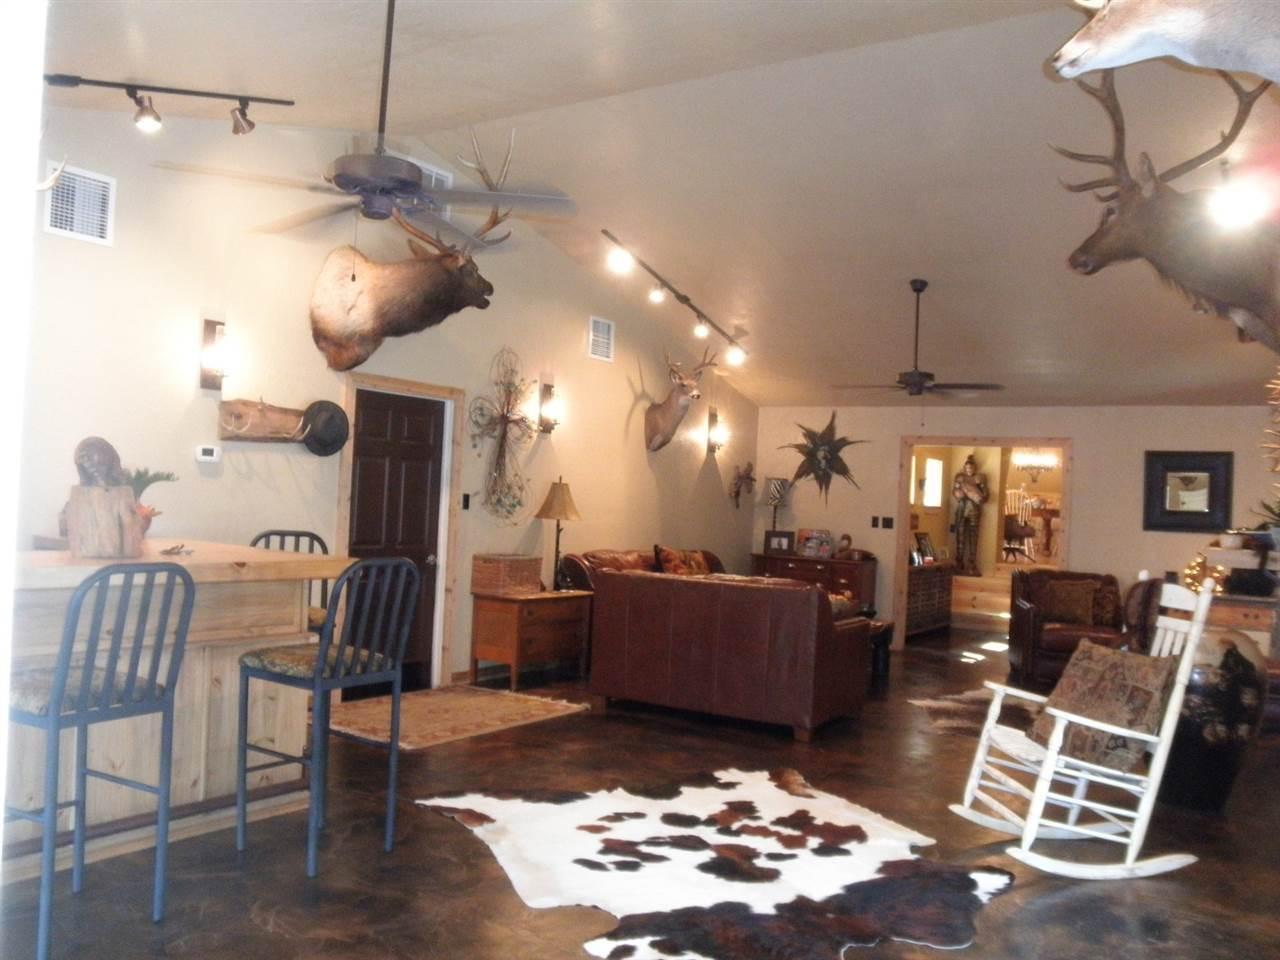 Sold Cross Sale W/ MLS | 54 Pike Lane  Ponca City, OK 74604 18